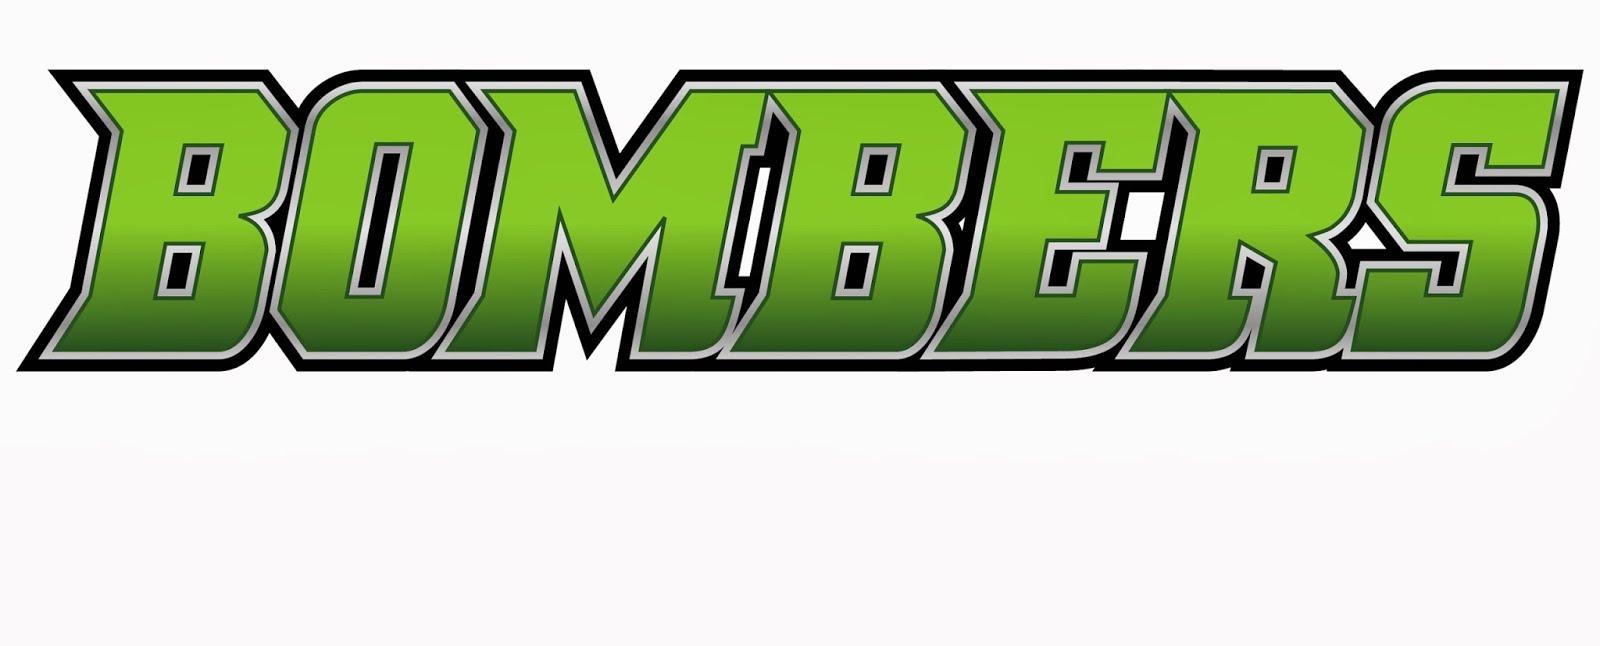 BombersLogo-Nameyoutub.jpg